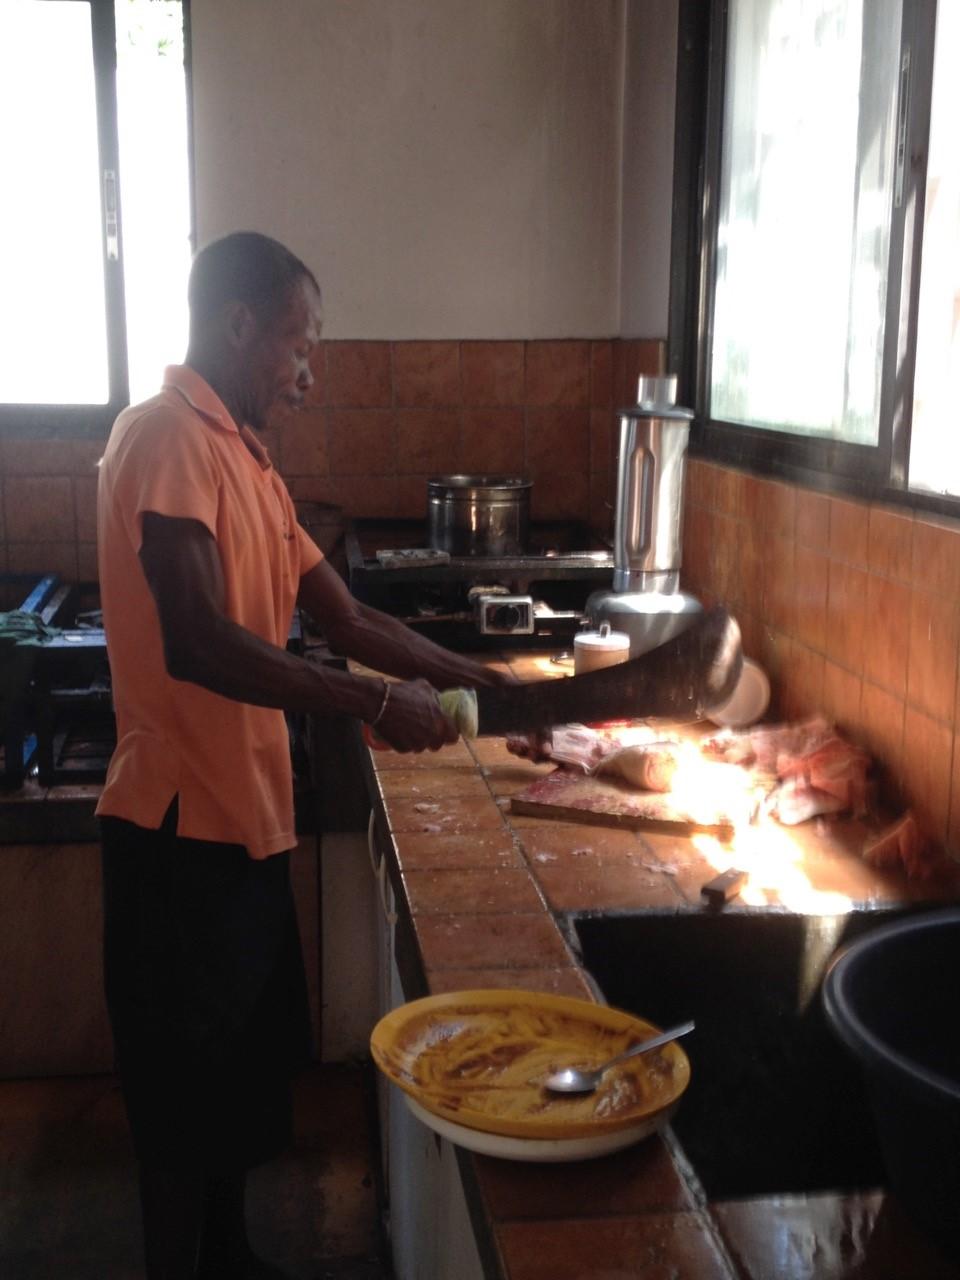 Maison_des_Anges_Küchenrenovation_Papa_Joseph_am_Kochen.jpg